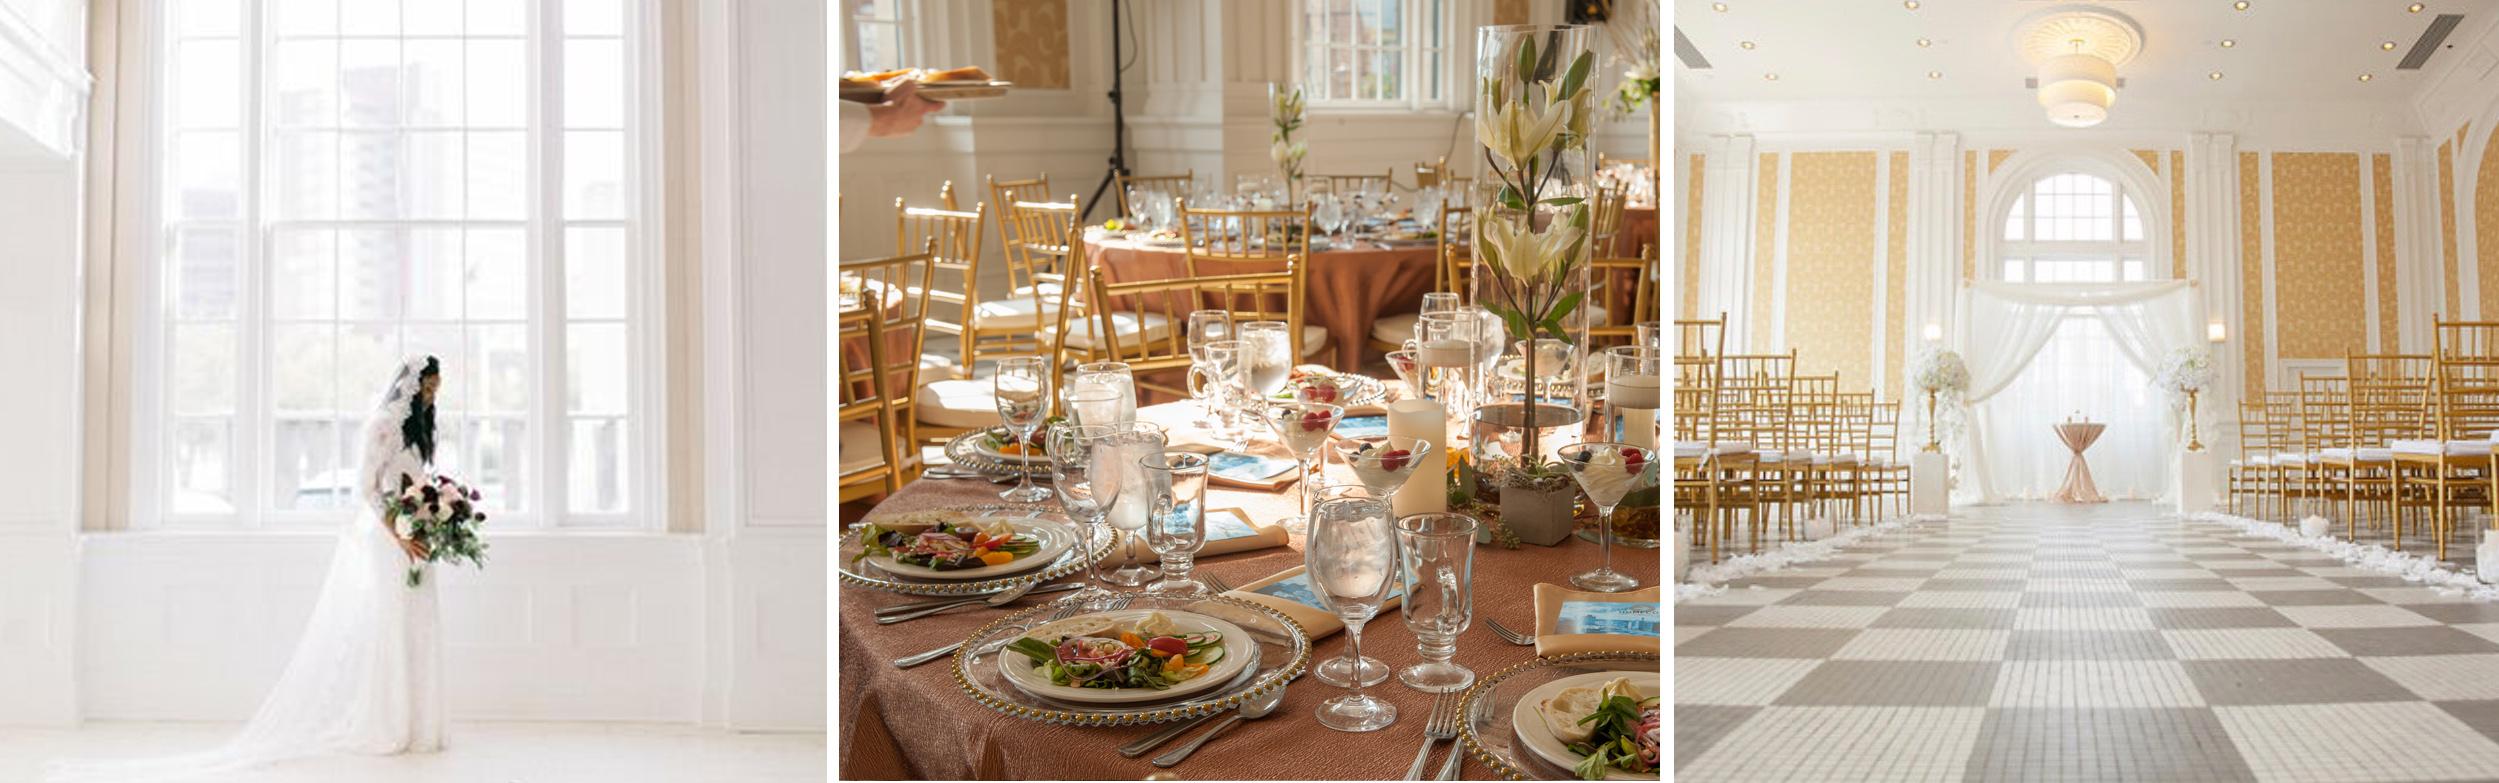 Weddings held in The Durant ballroom